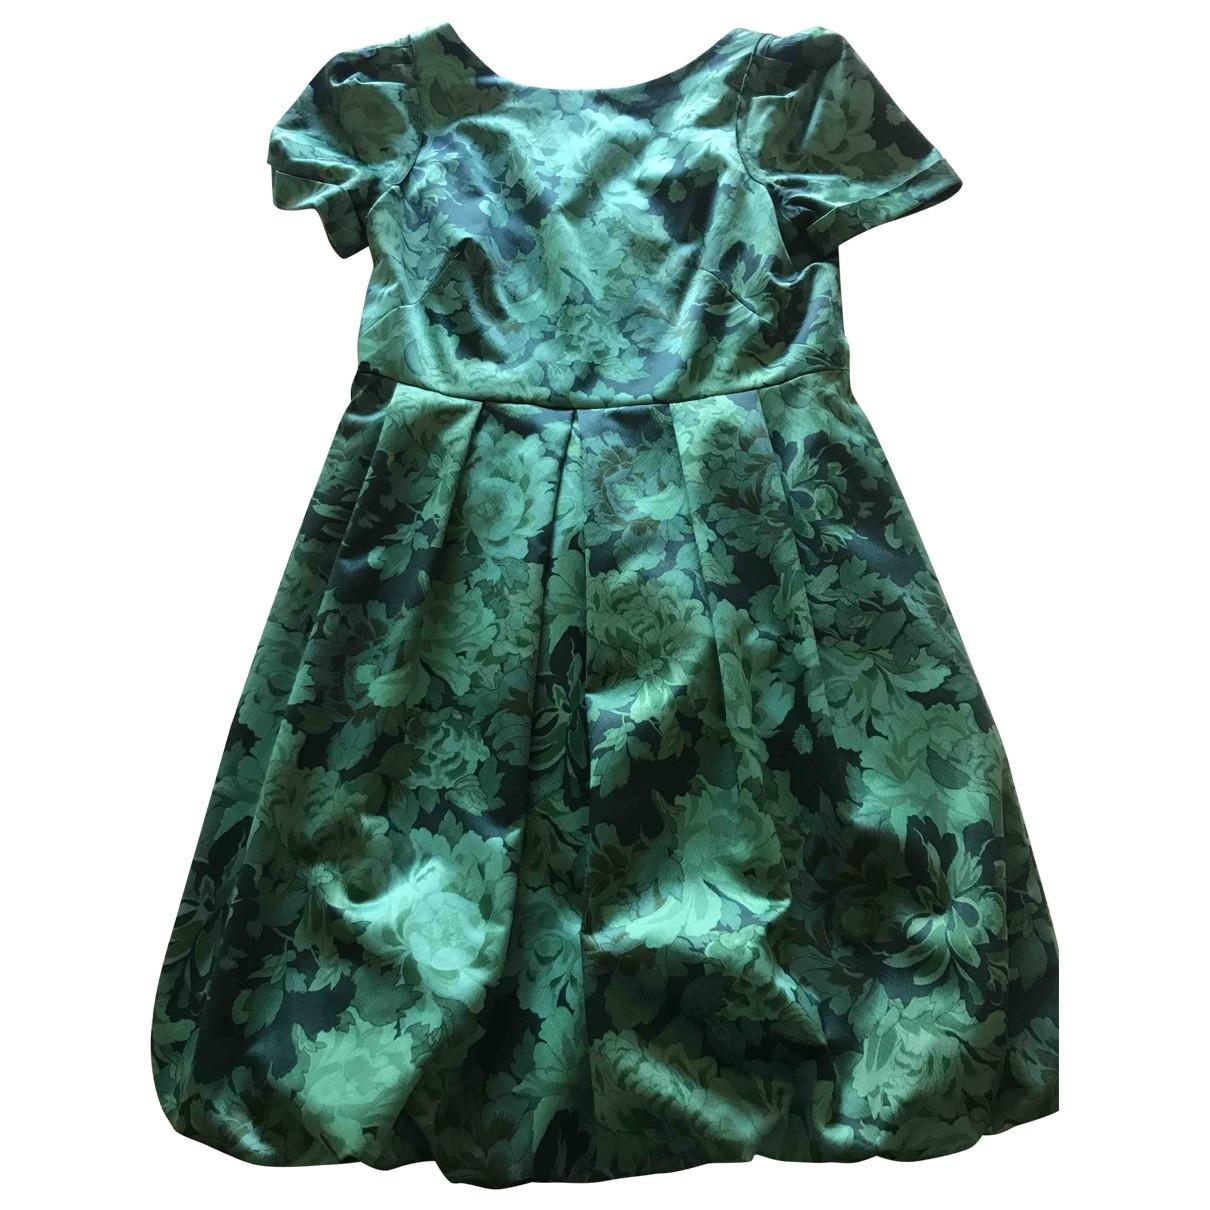 Max & Co \N Green dress for Women 46 IT